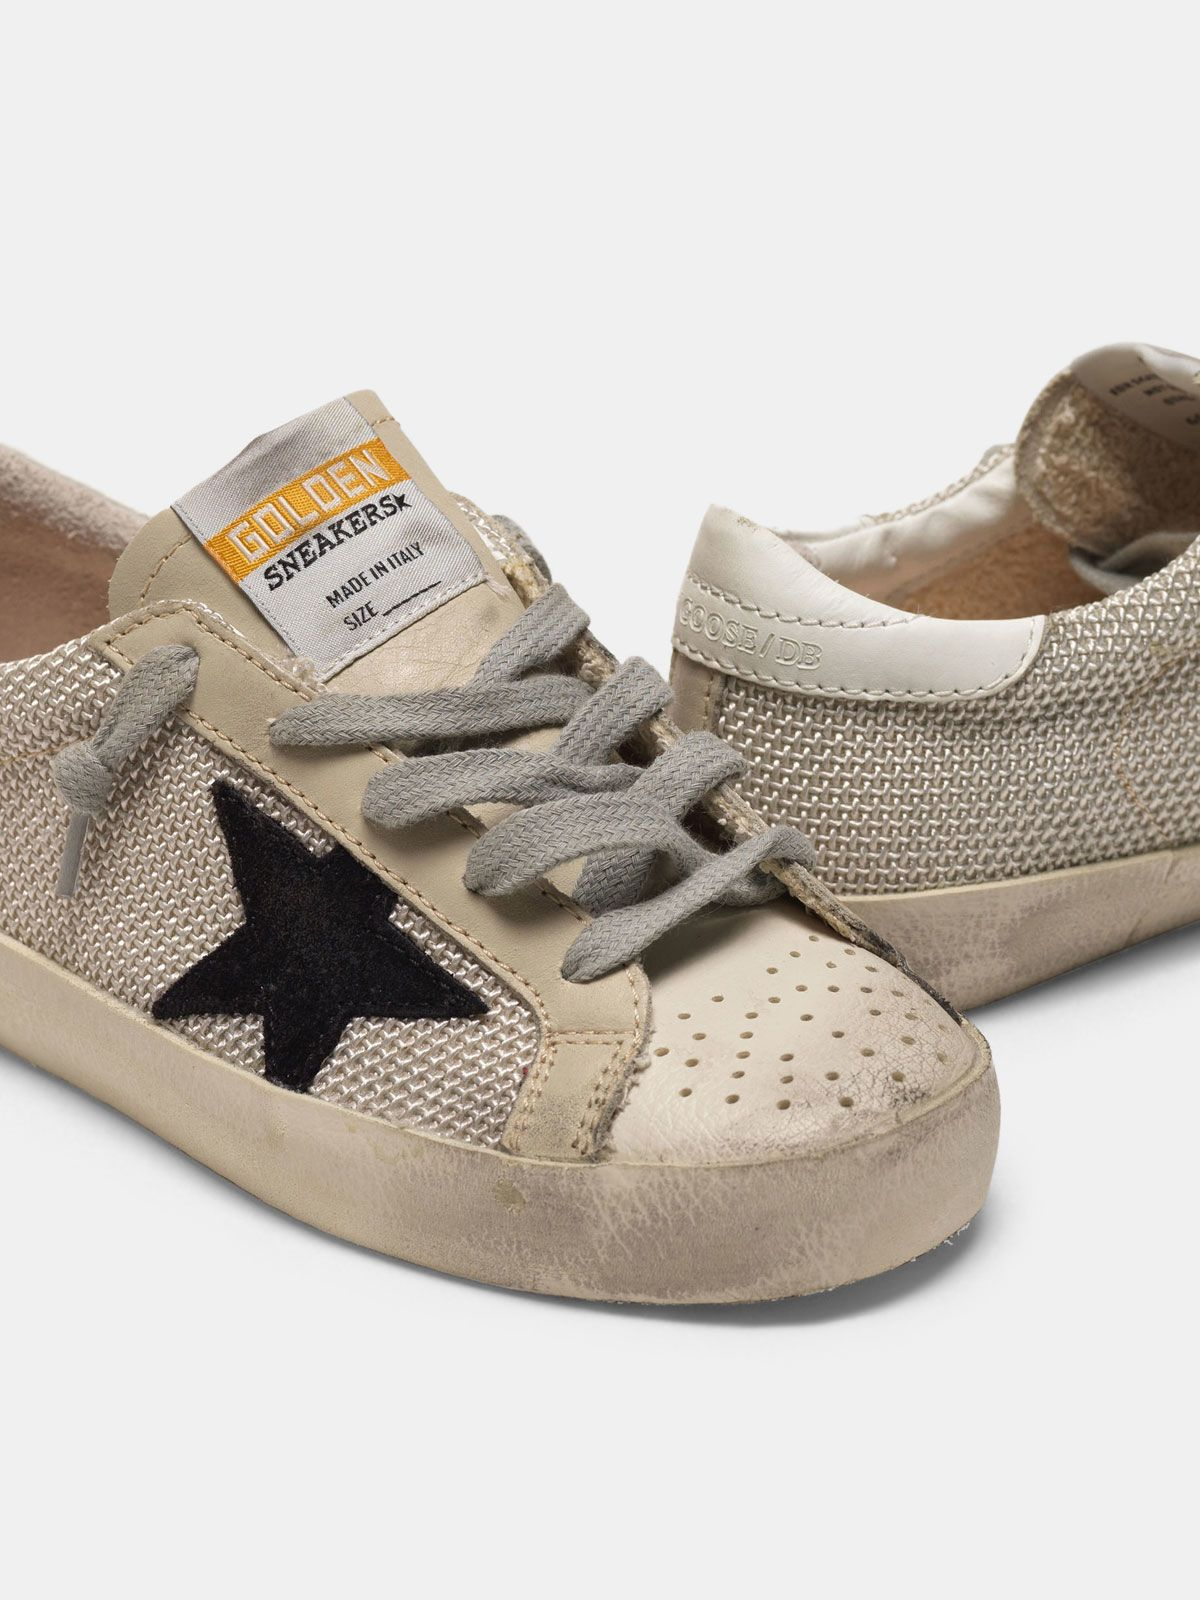 Golden Goose - Super-Star sneakers in hi-tech fabric with nubuck star in